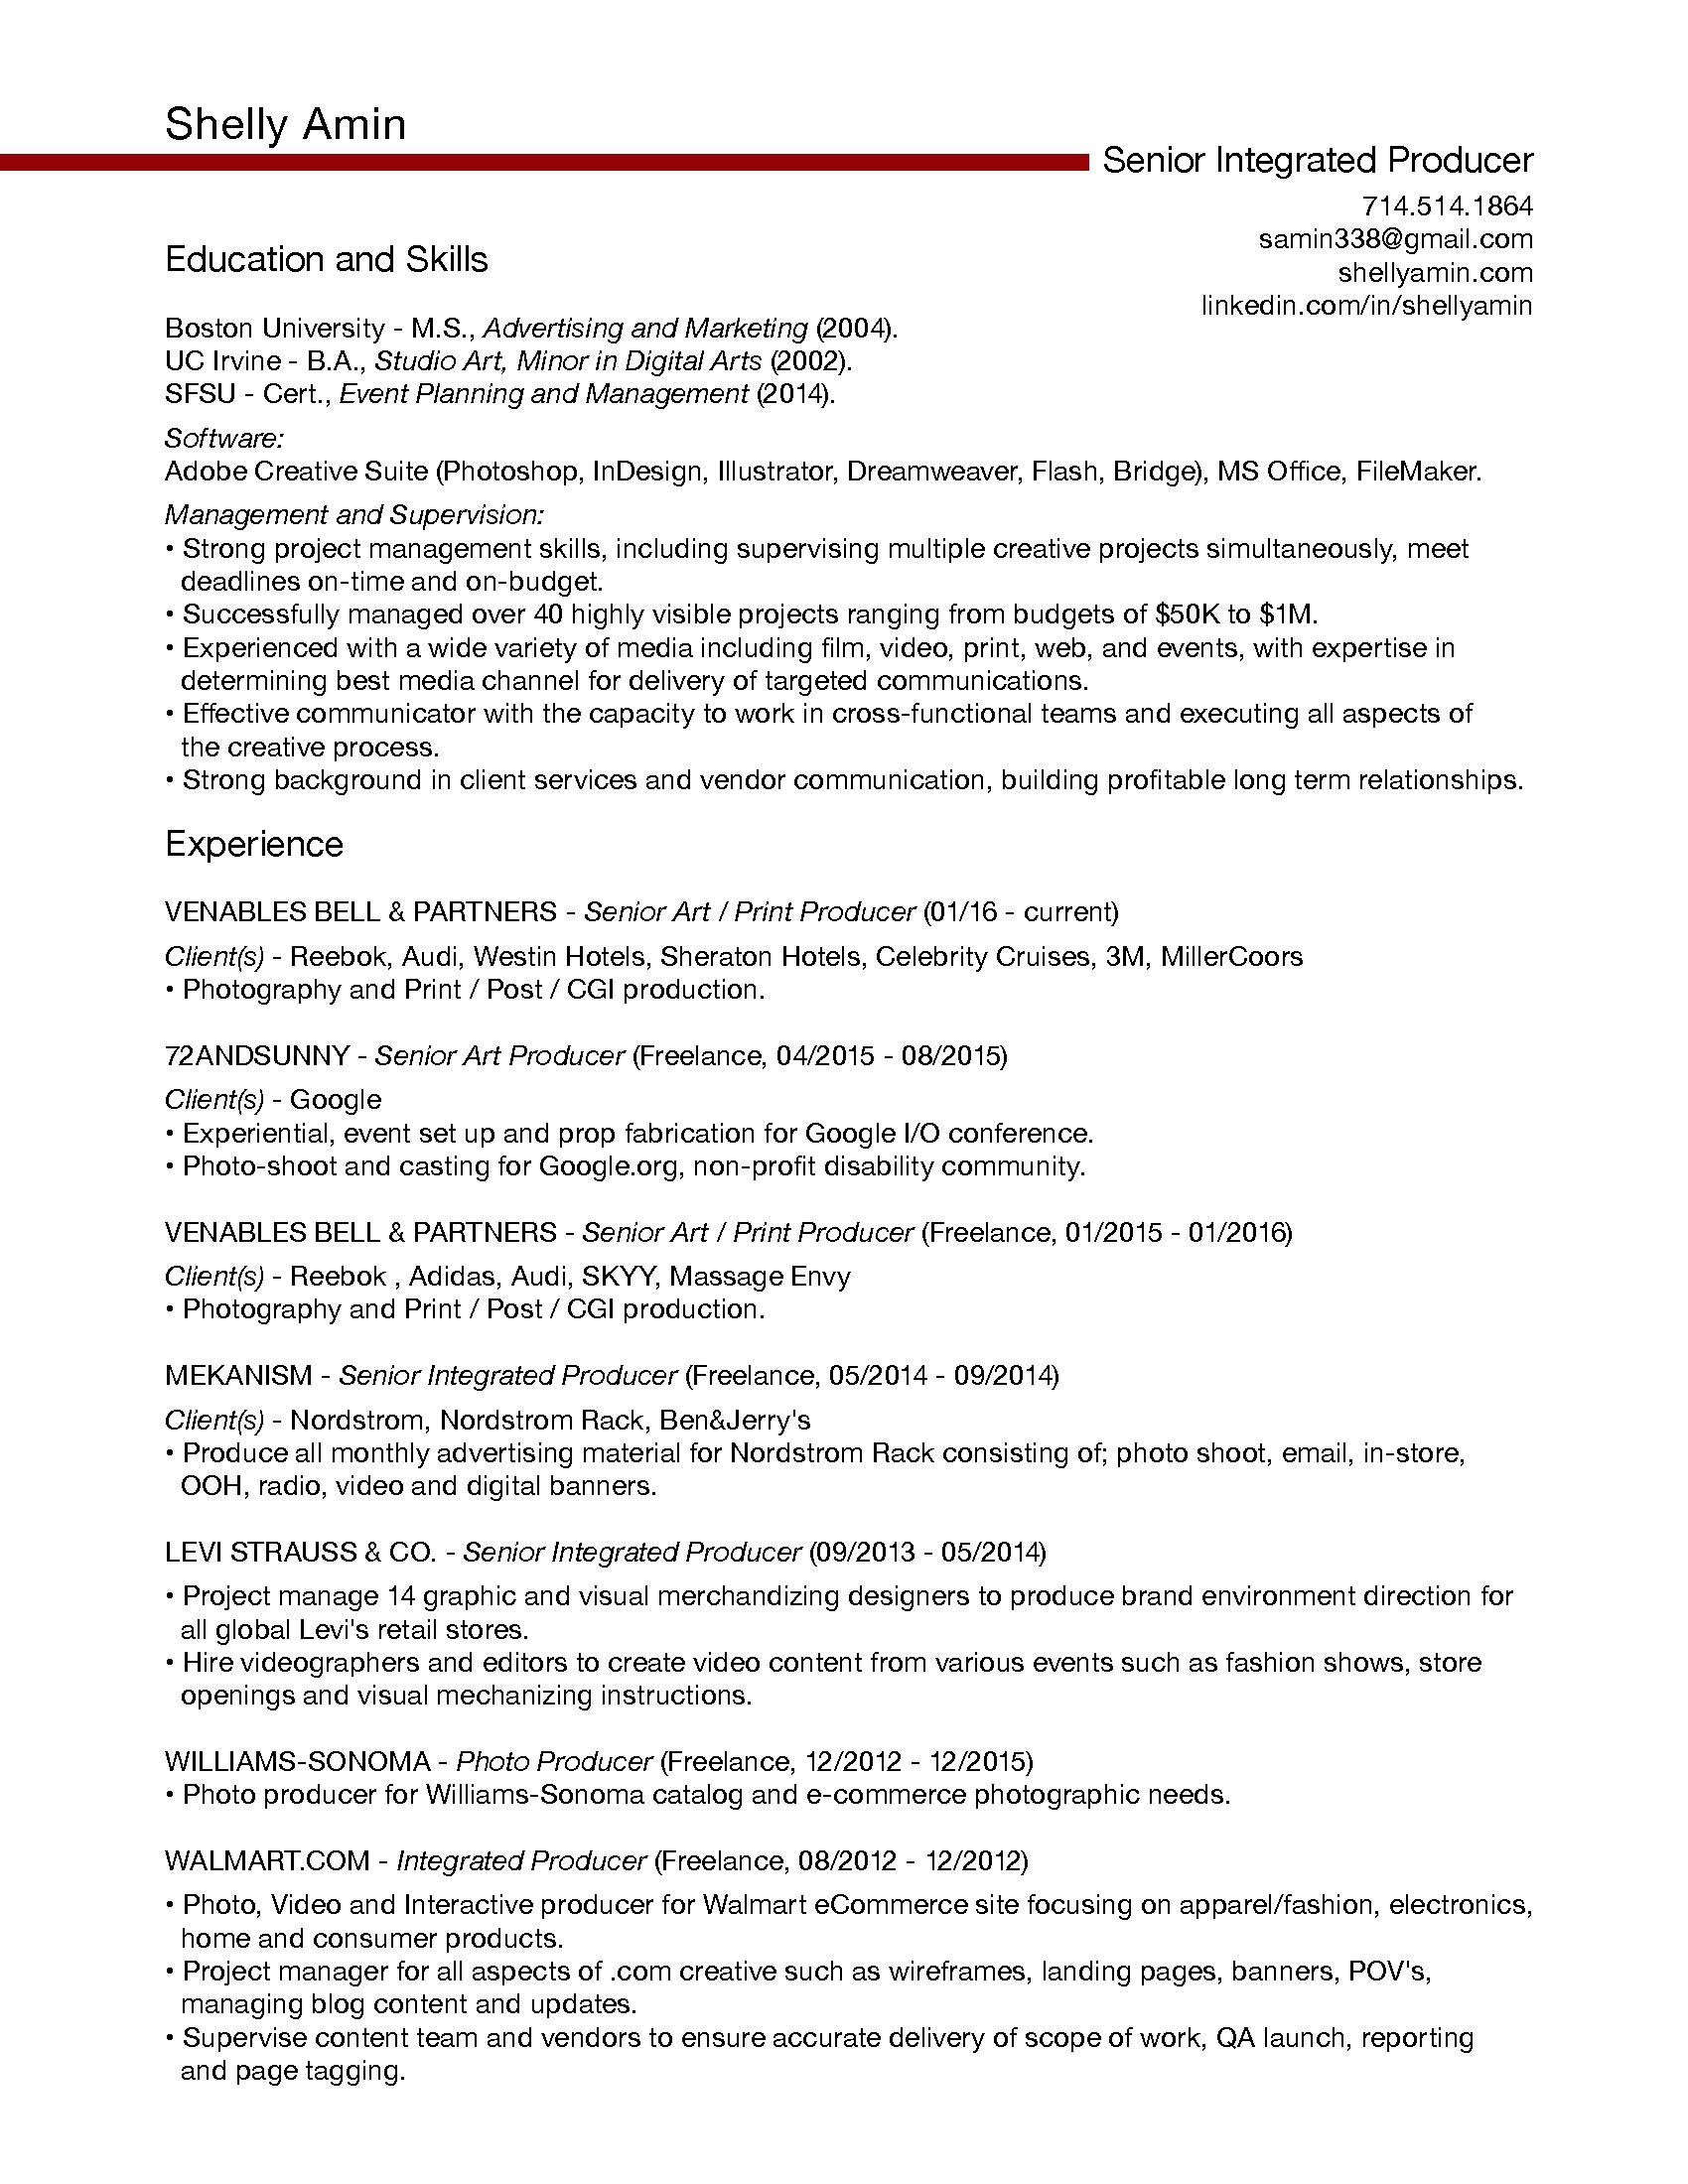 ShellyAminResume_Page_1.jpg